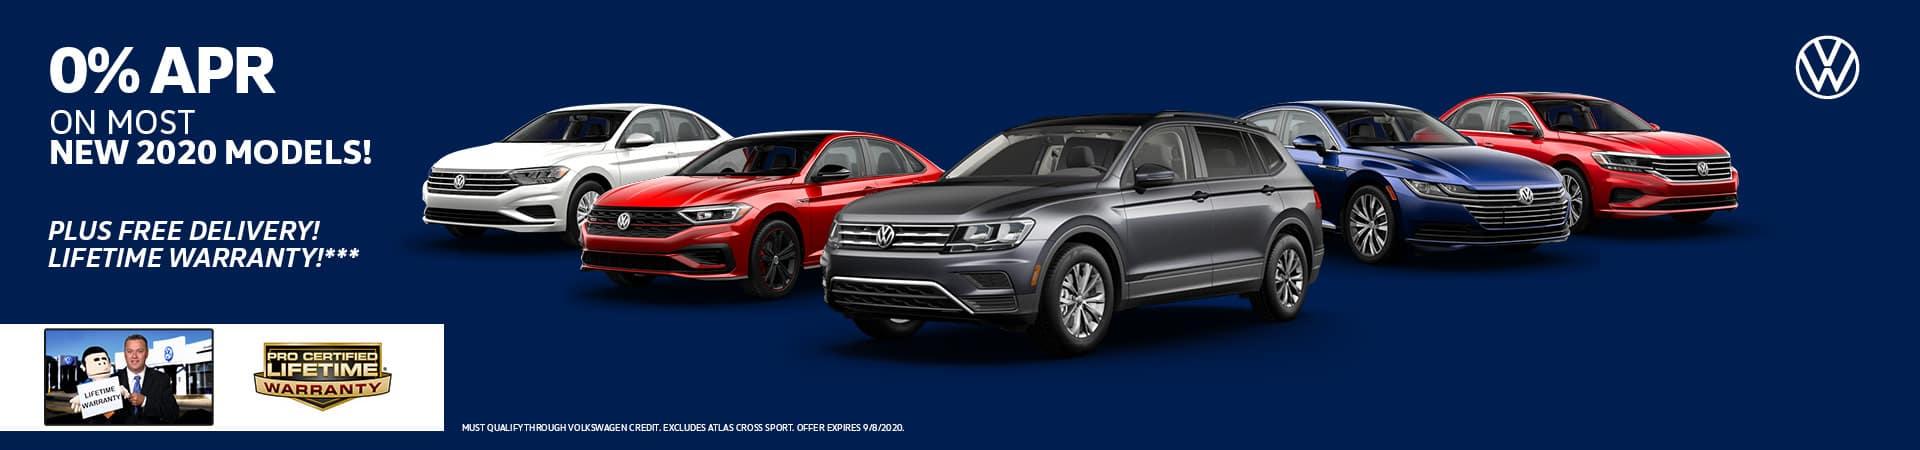 0% APR on Most Volkswagen Models | Cincinnati, OH